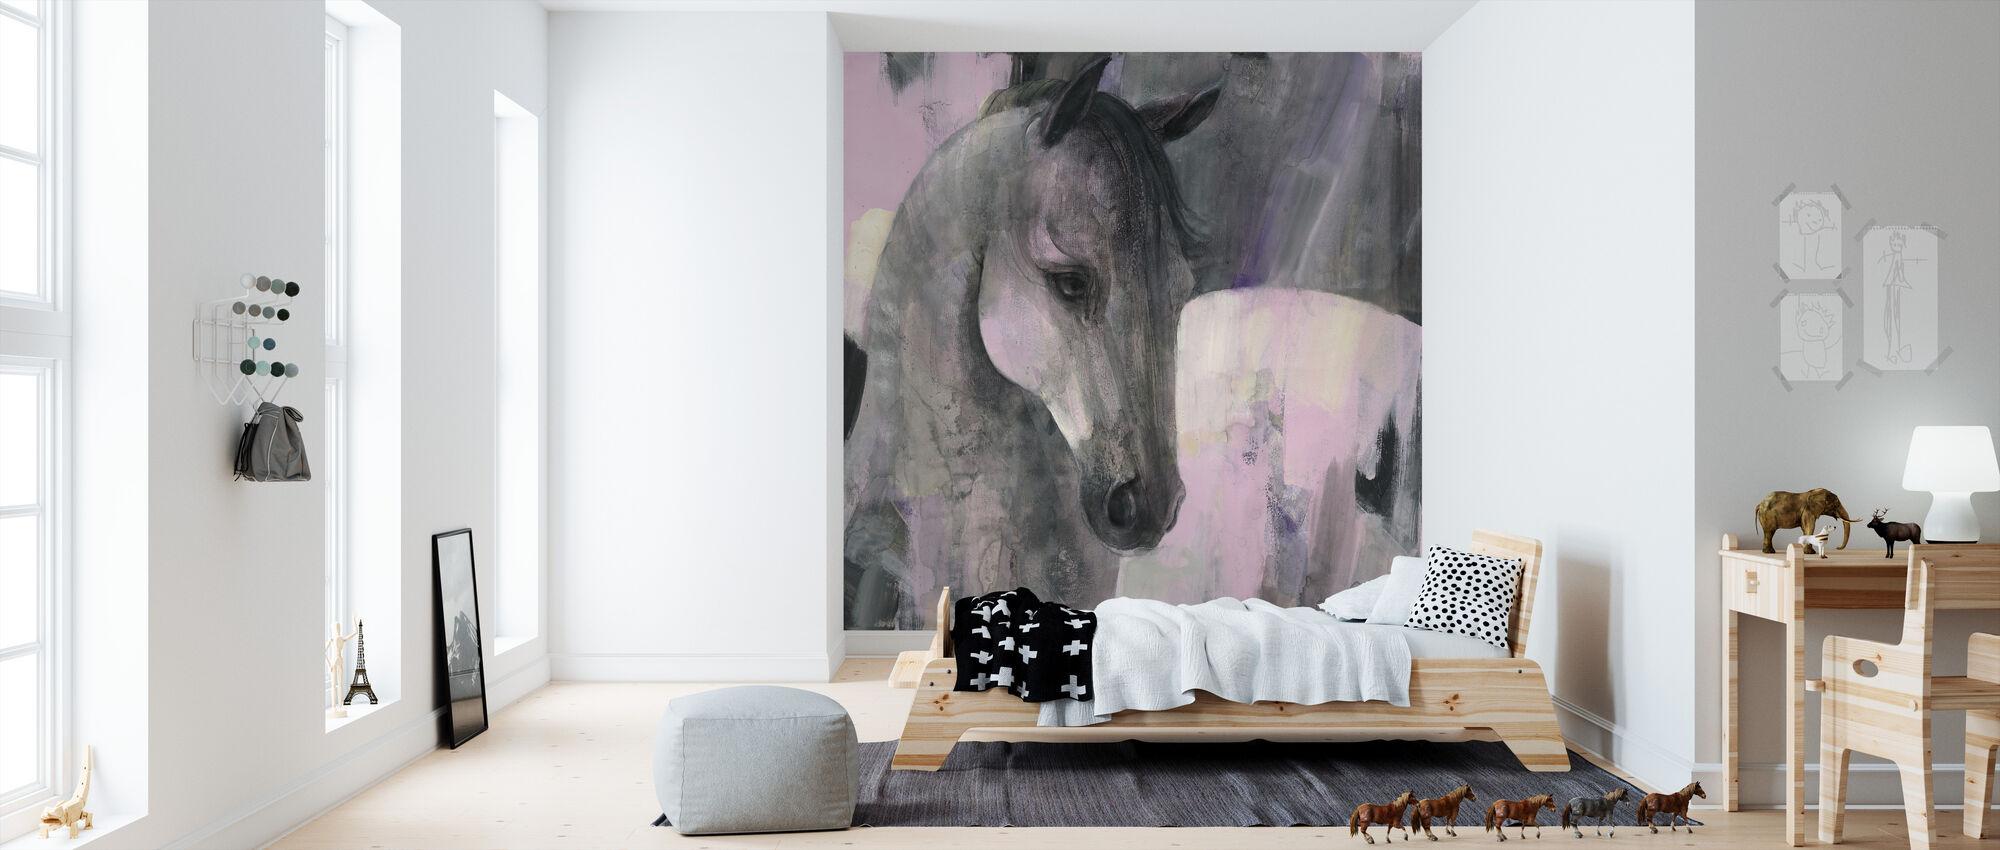 Gallant - Wallpaper - Kids Room